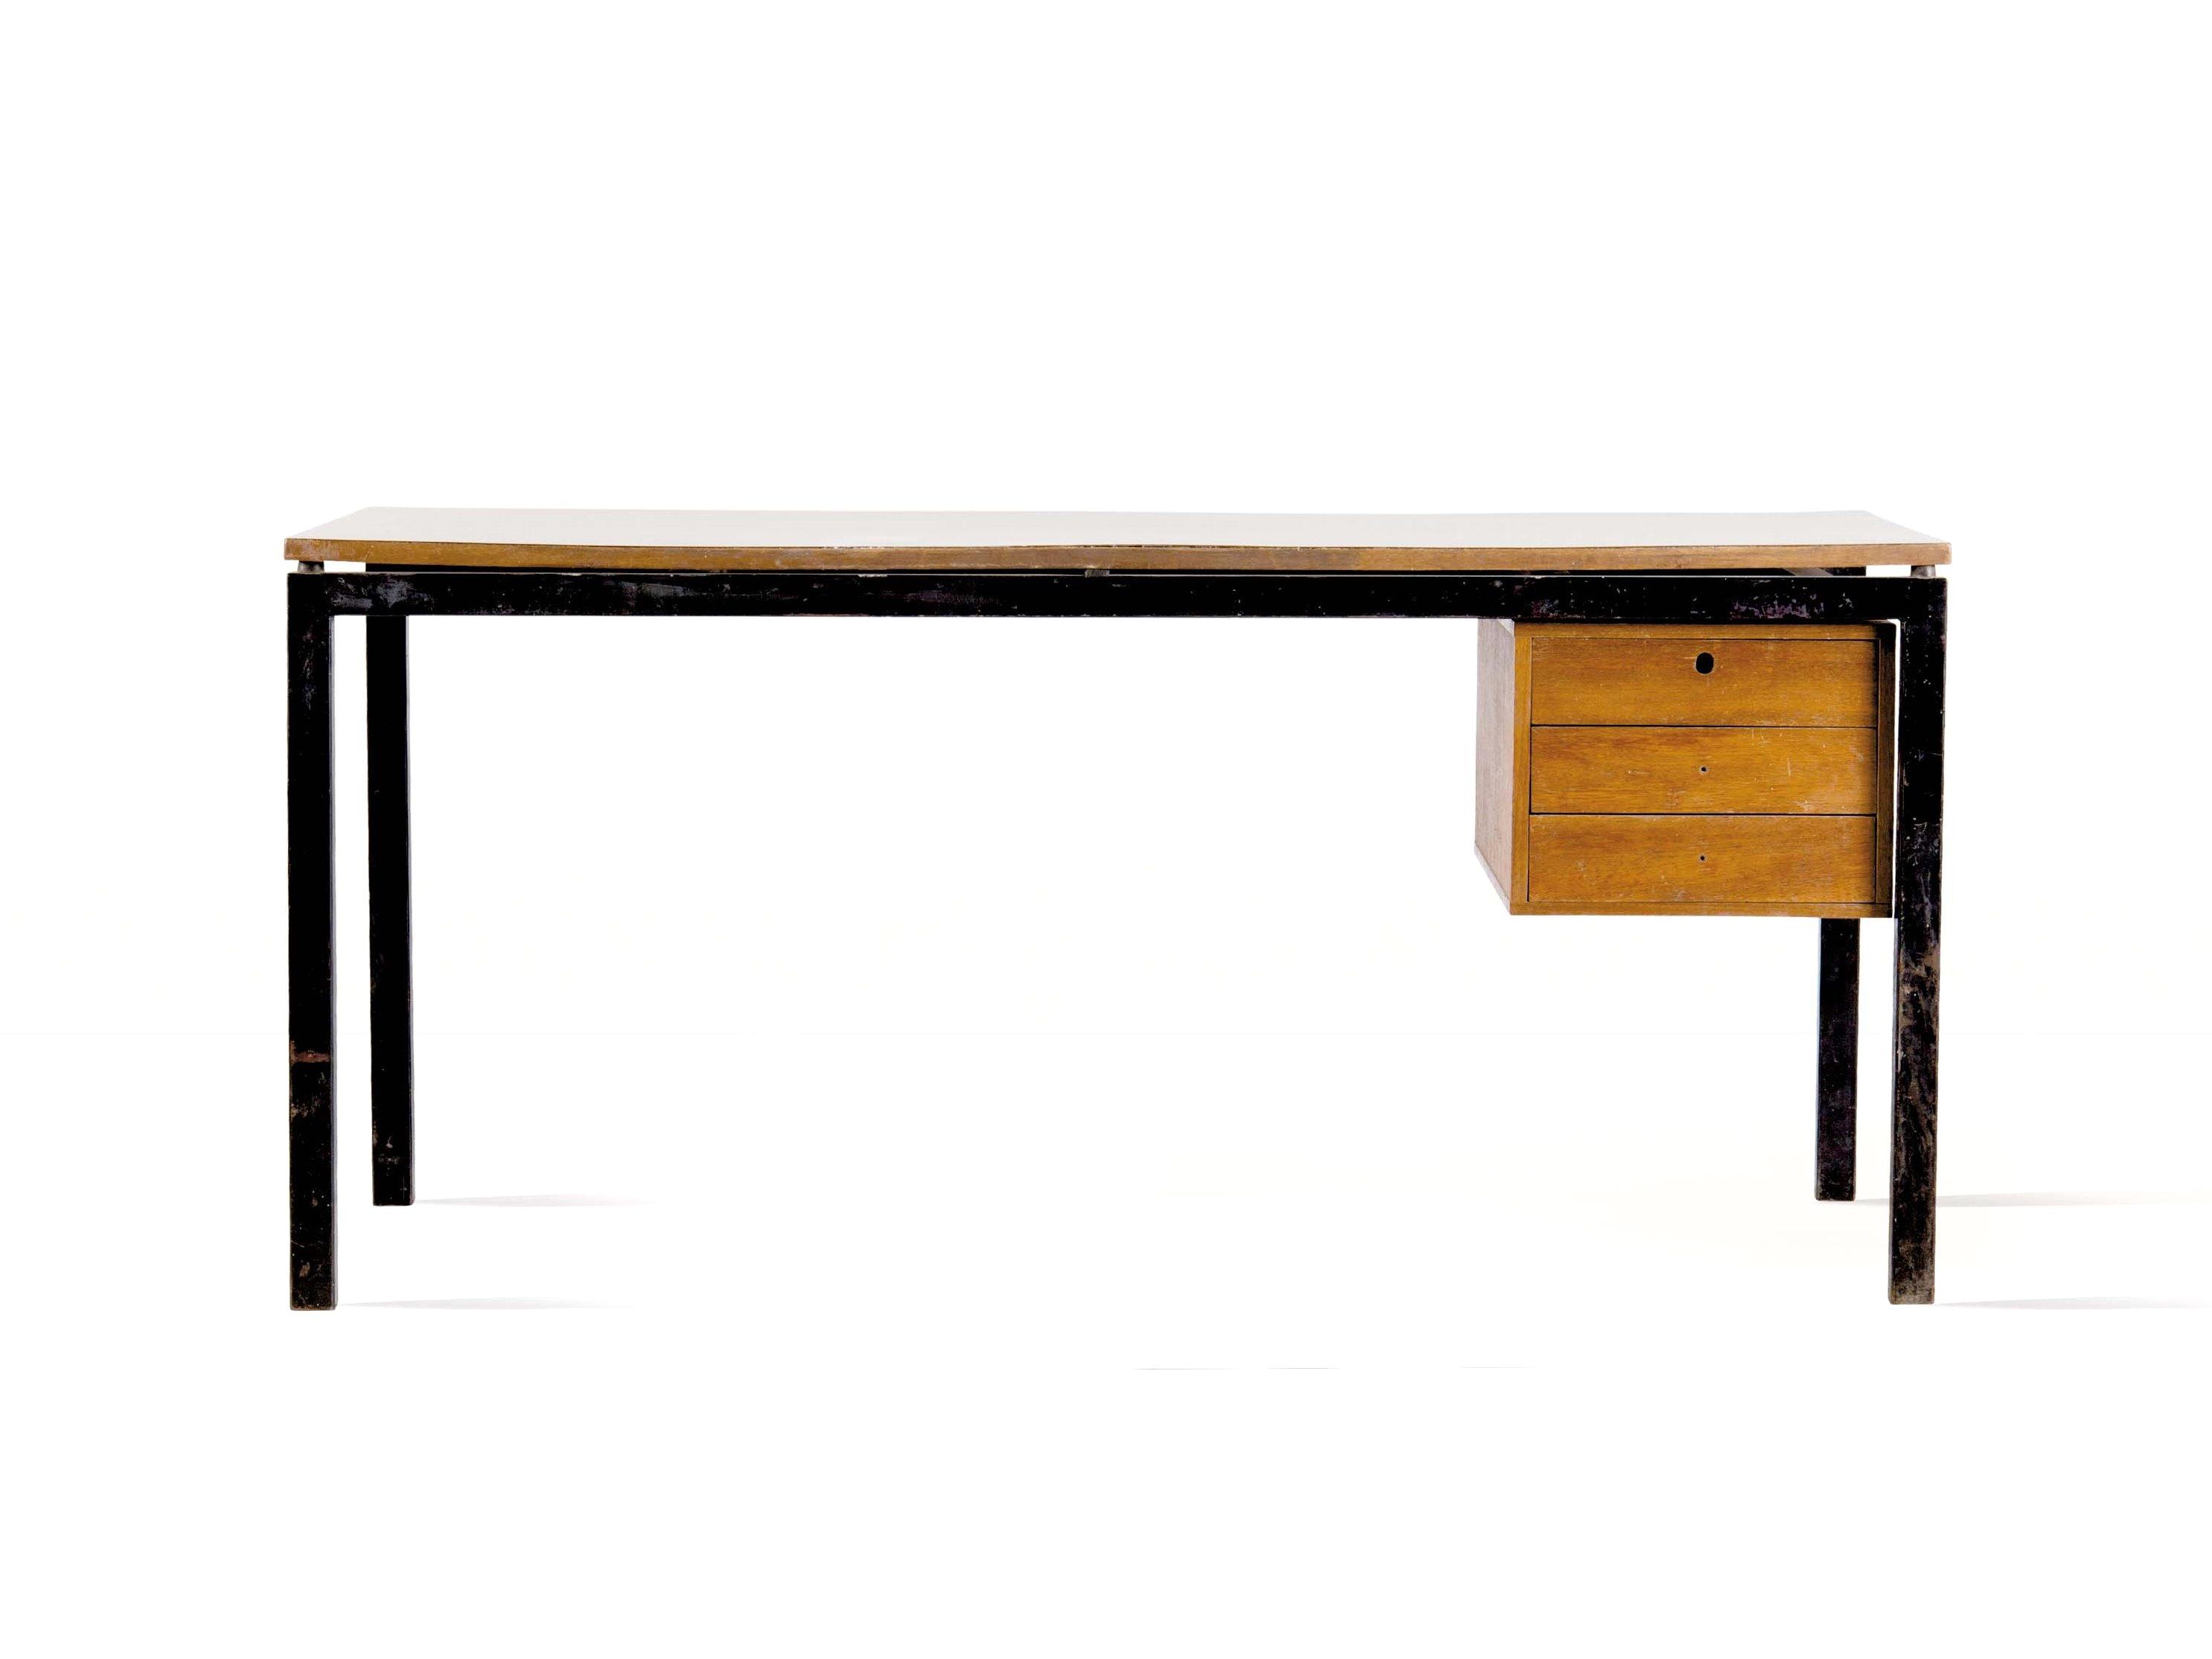 Galerie alexandre guillemain artefact design charlotte perriand bureau edition steph simon - Bureau charlotte perriand ...